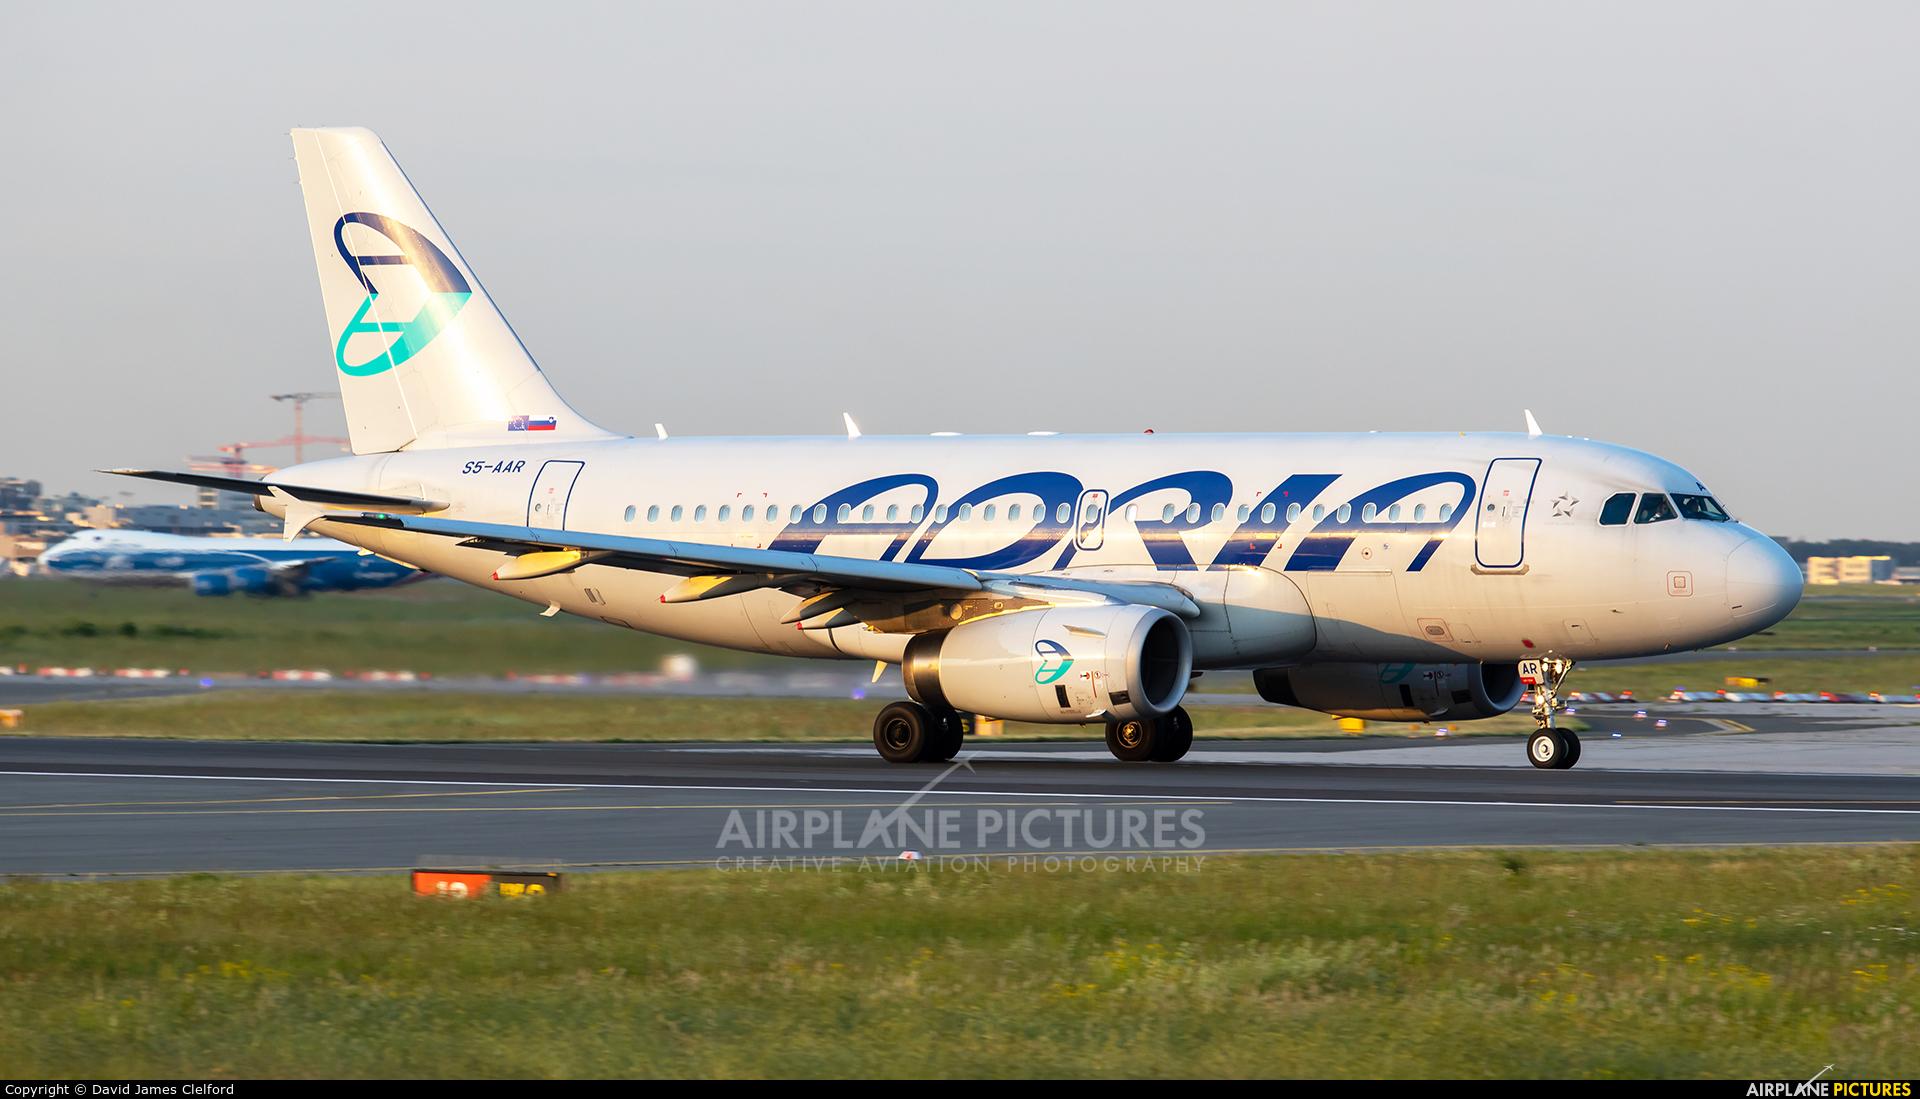 Adria Airways S5-AAR aircraft at Frankfurt